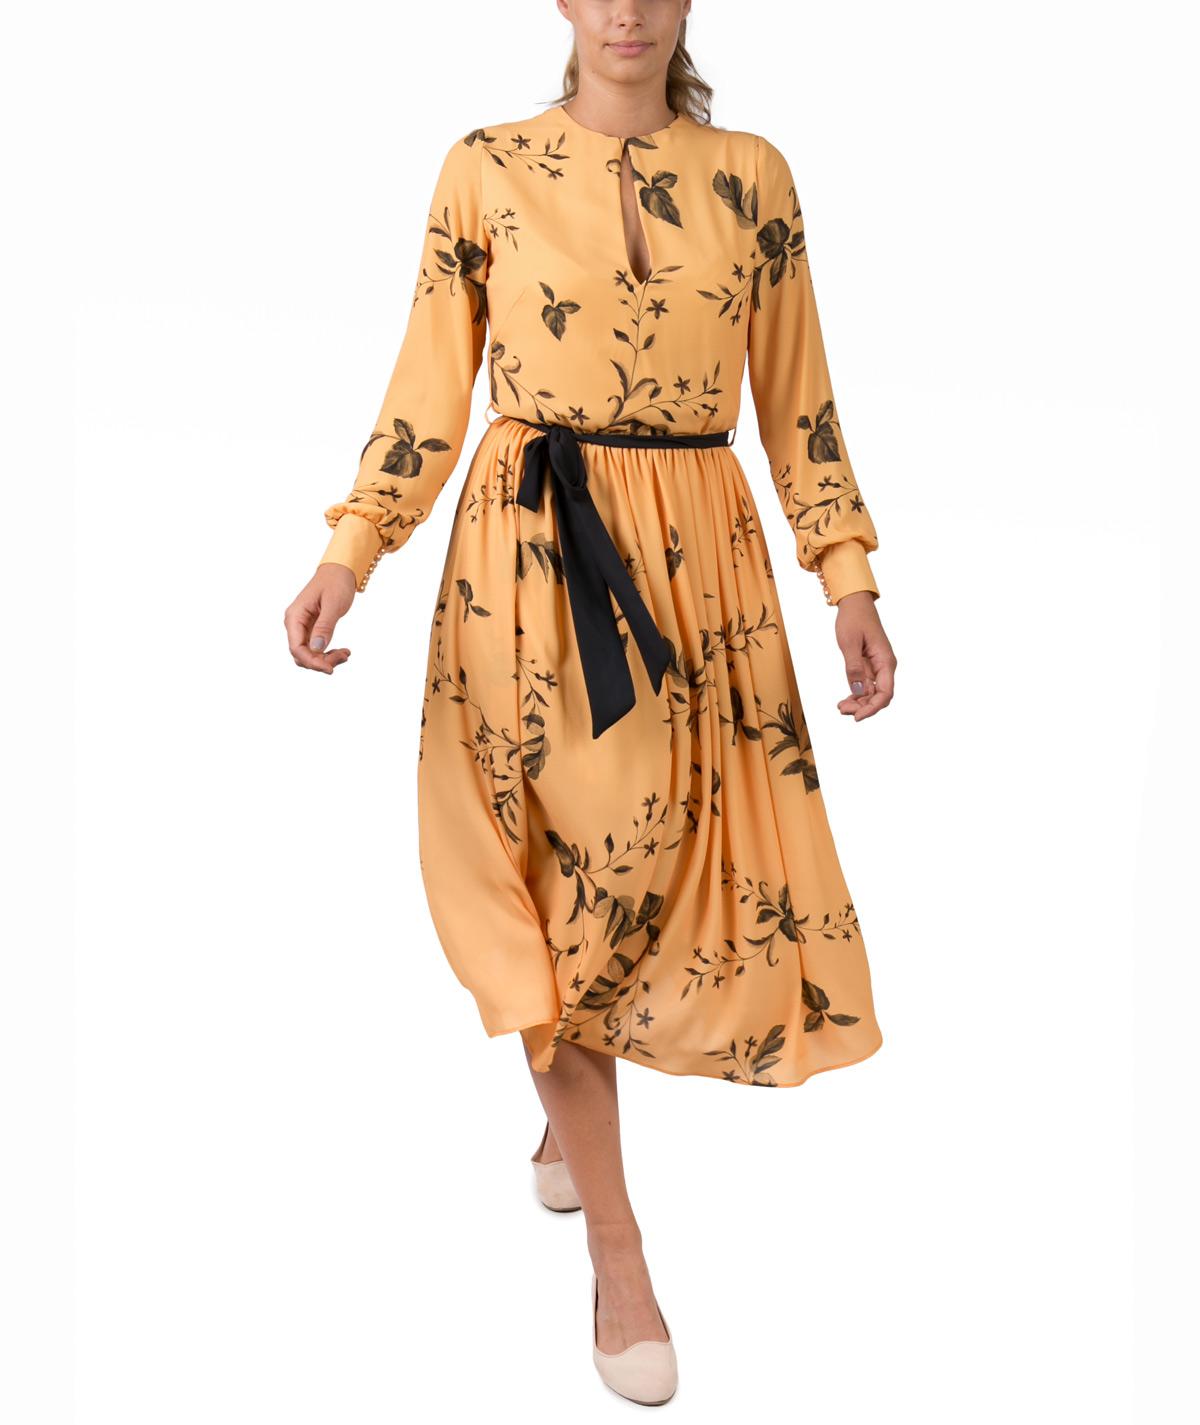 Midi Cocktail Dress